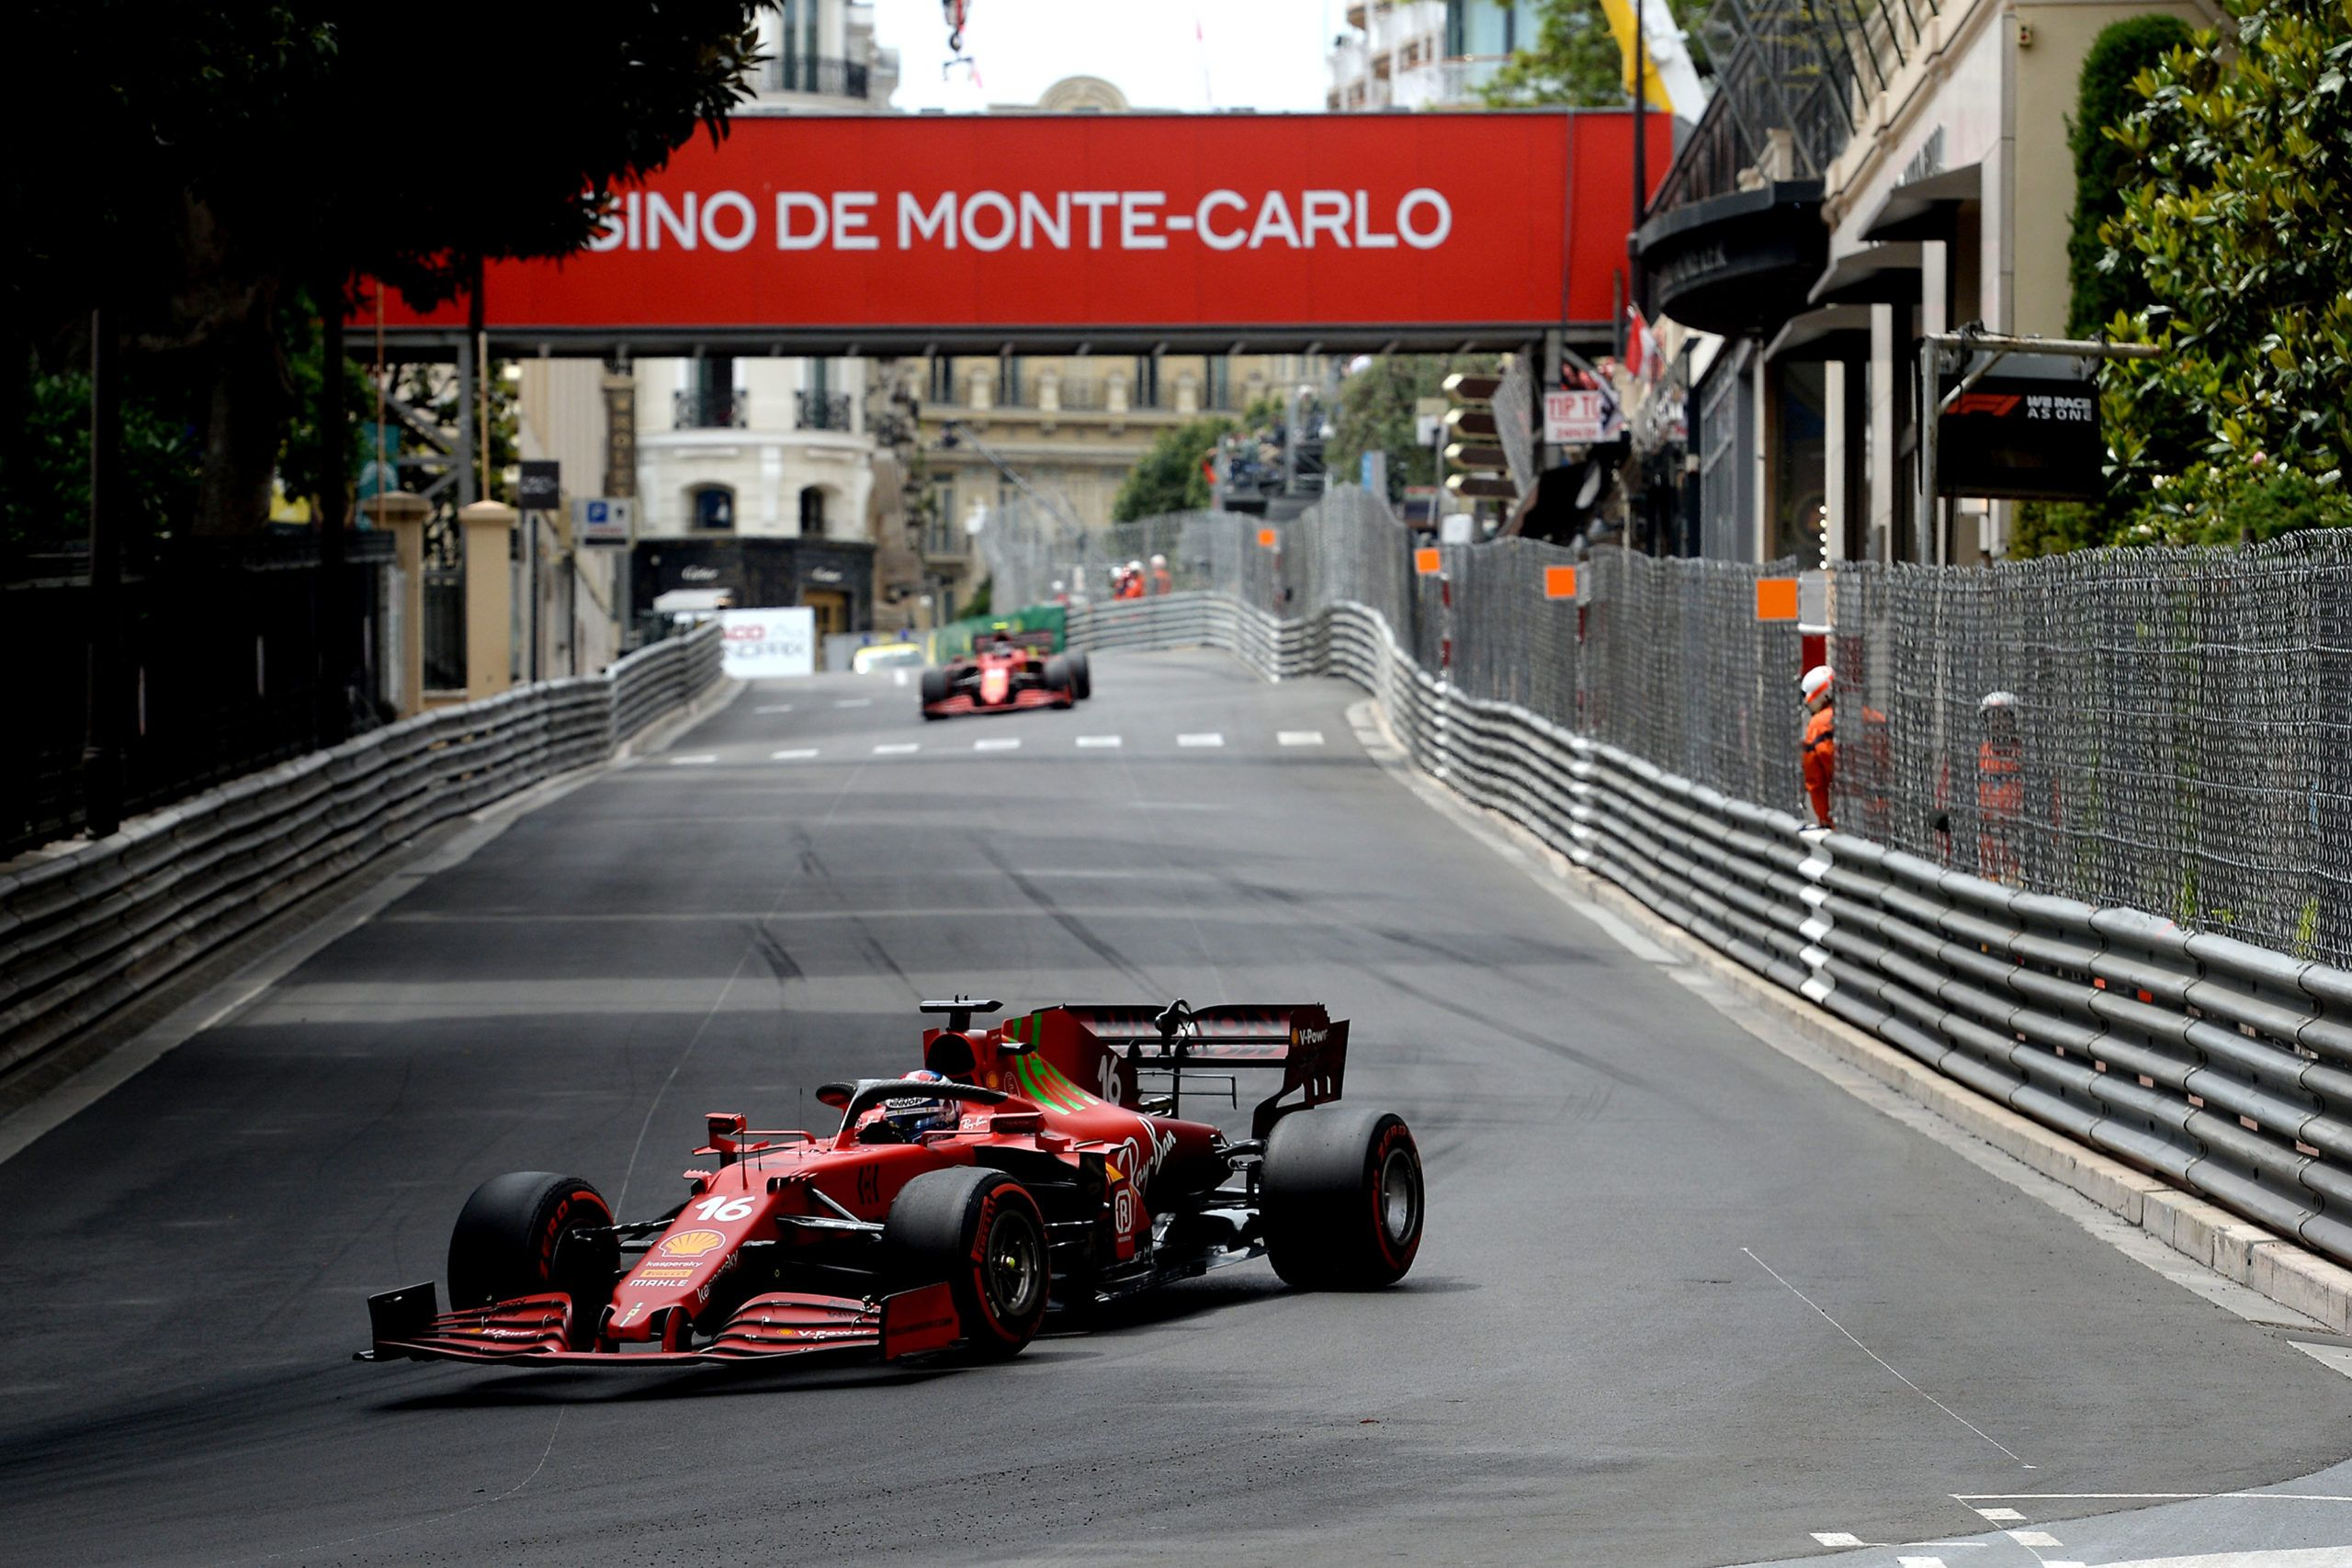 F1, Ferrari, Monaco GP